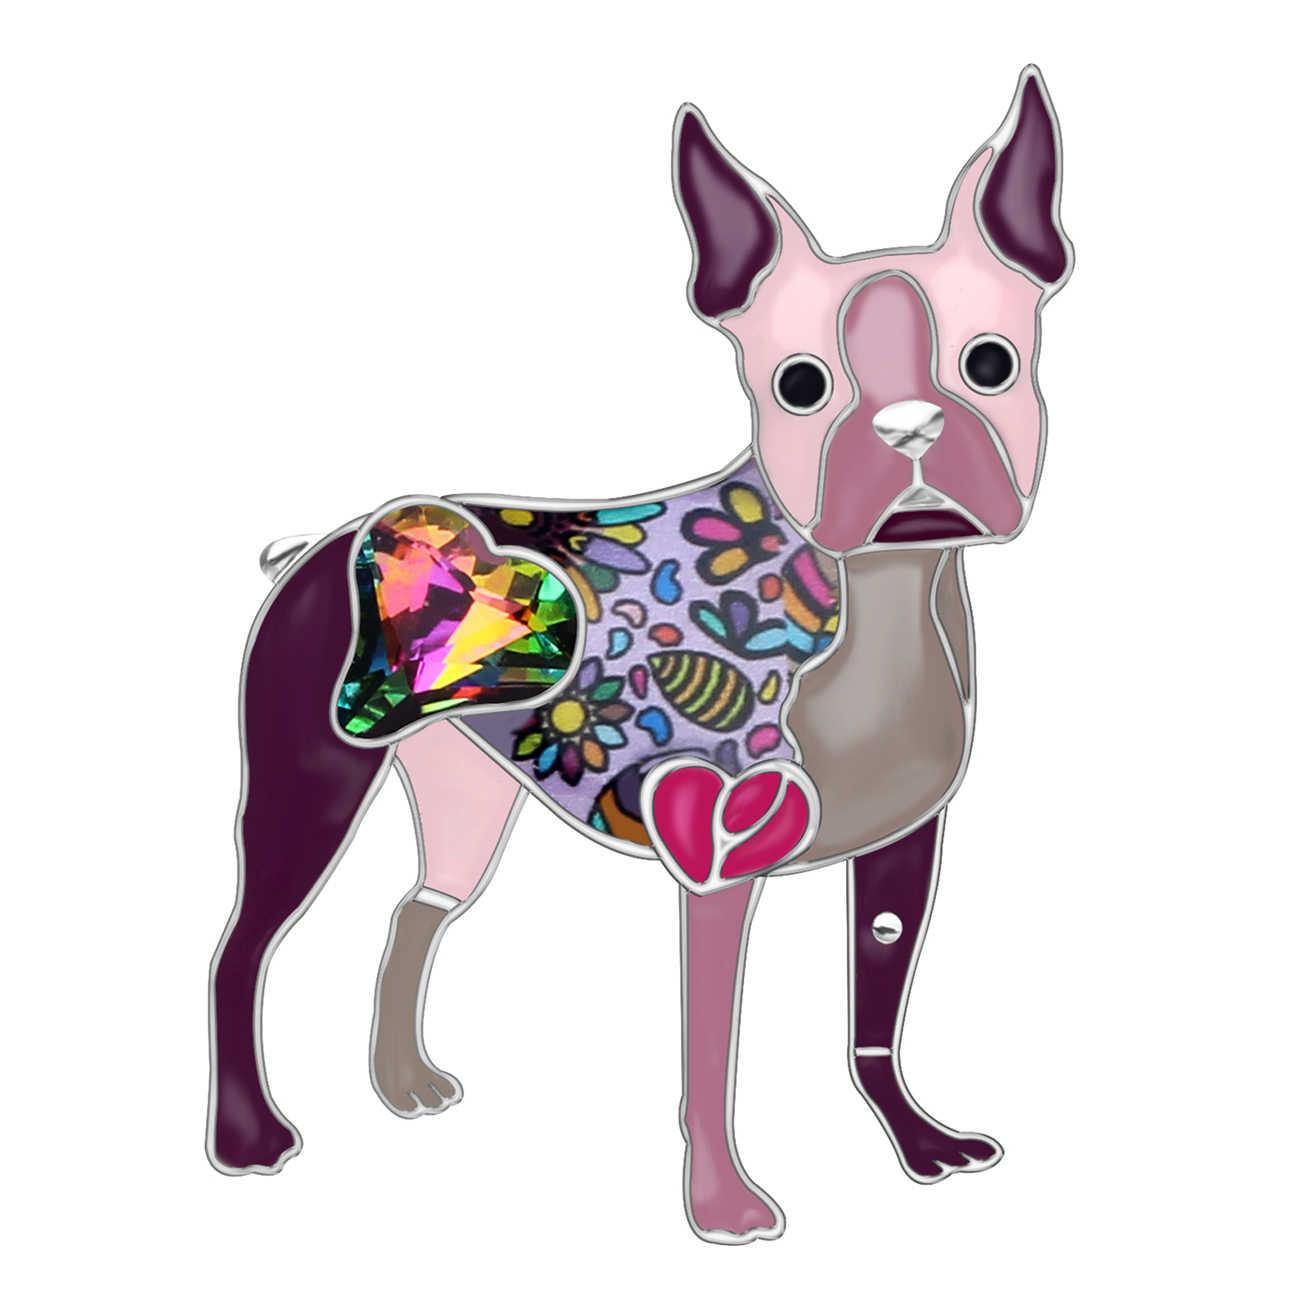 WEVENI エナメル合金ラインストーンボストンテリア犬ブローチピンかわいい動物ジュエリー女性ガールズギフトスカーフ装飾ビジュー